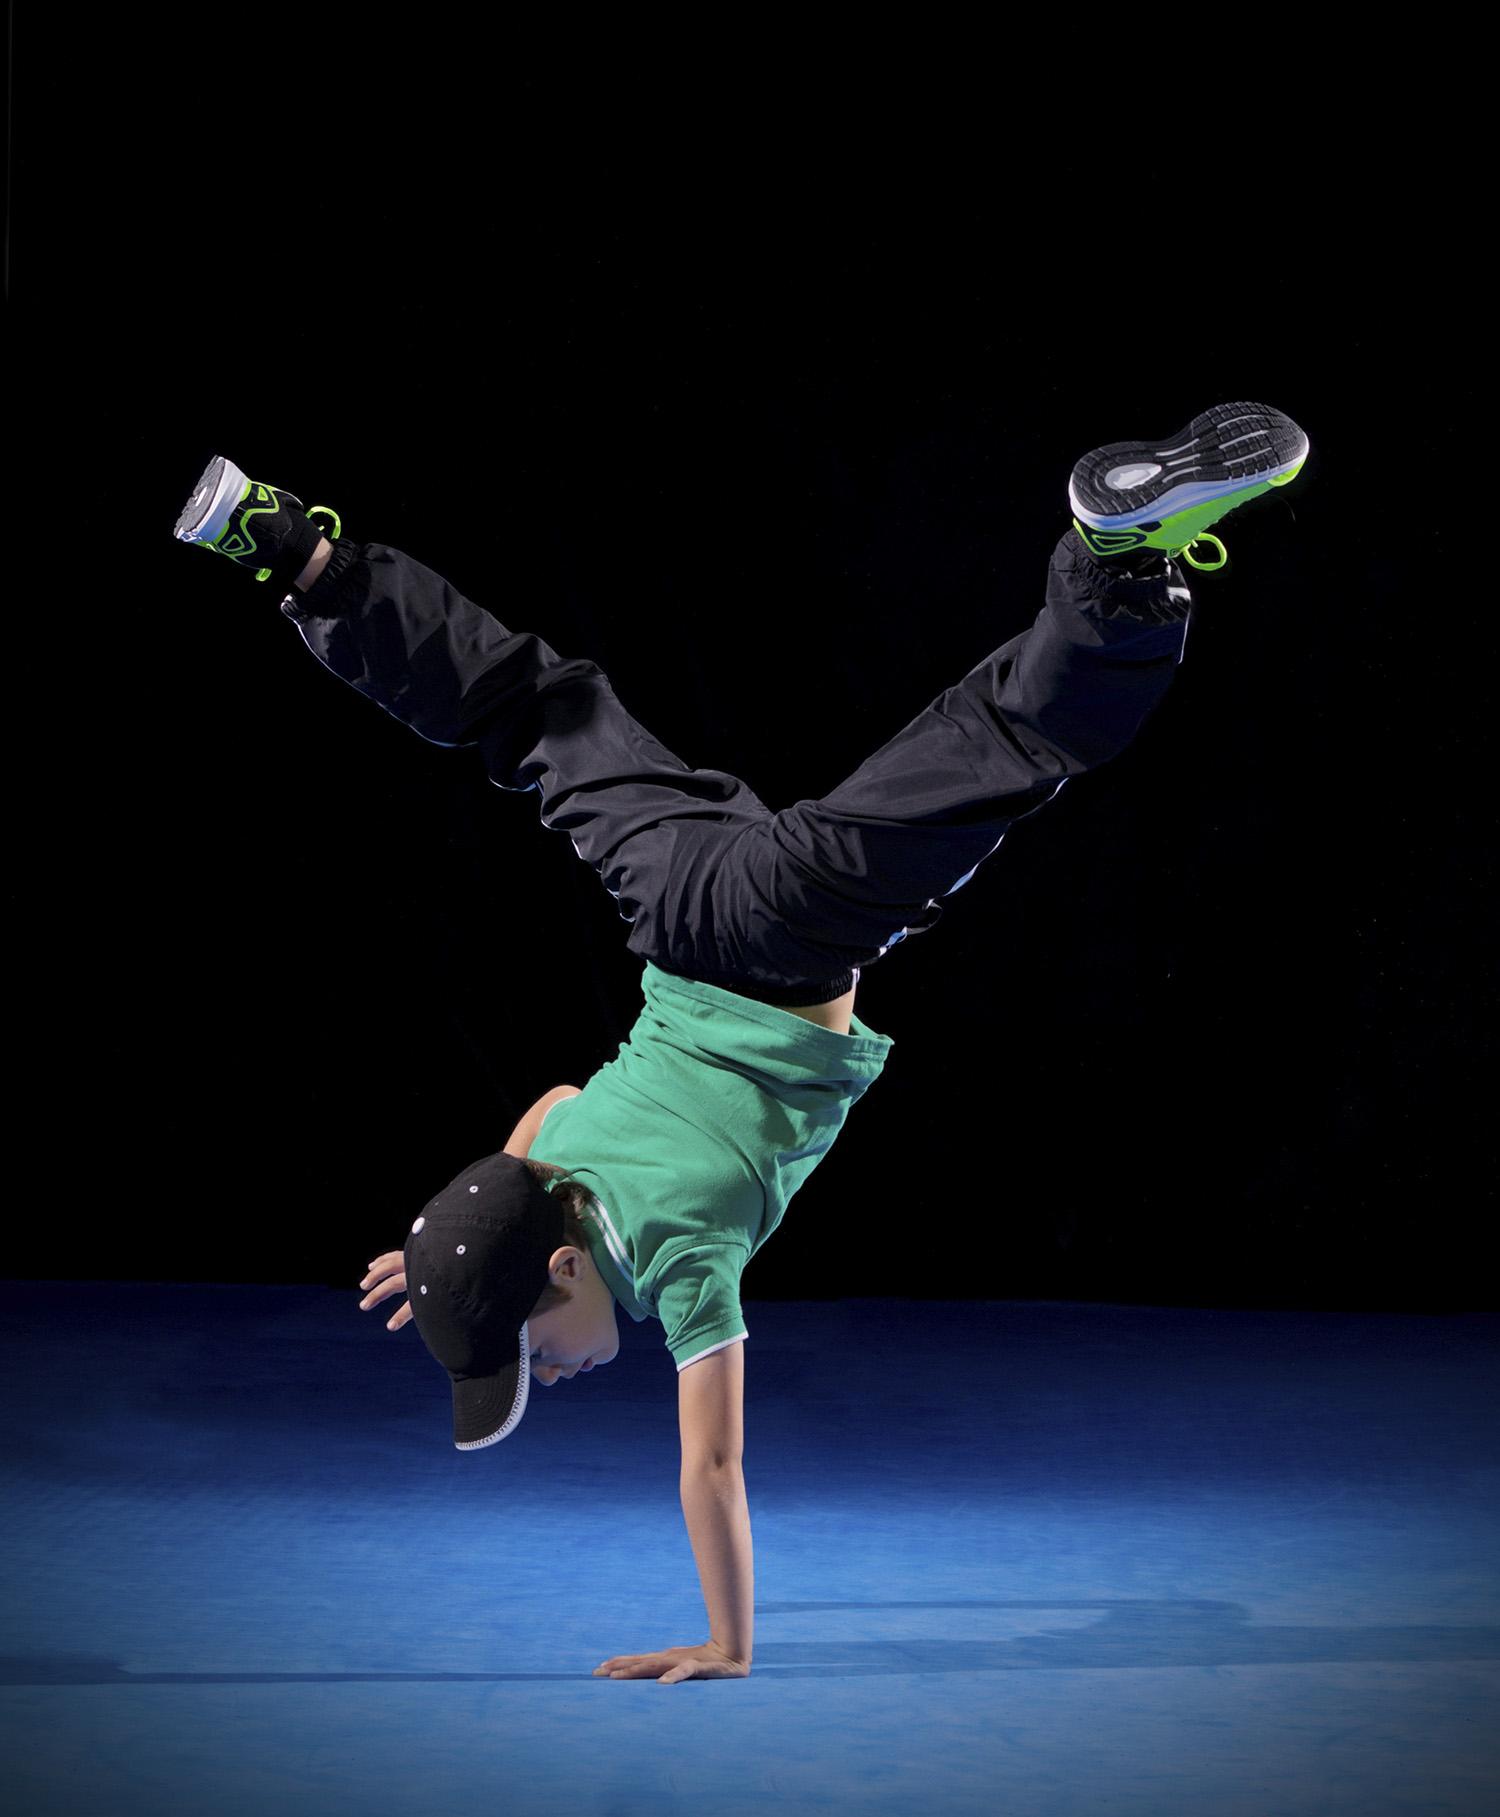 Boys hip-hop image.jpg